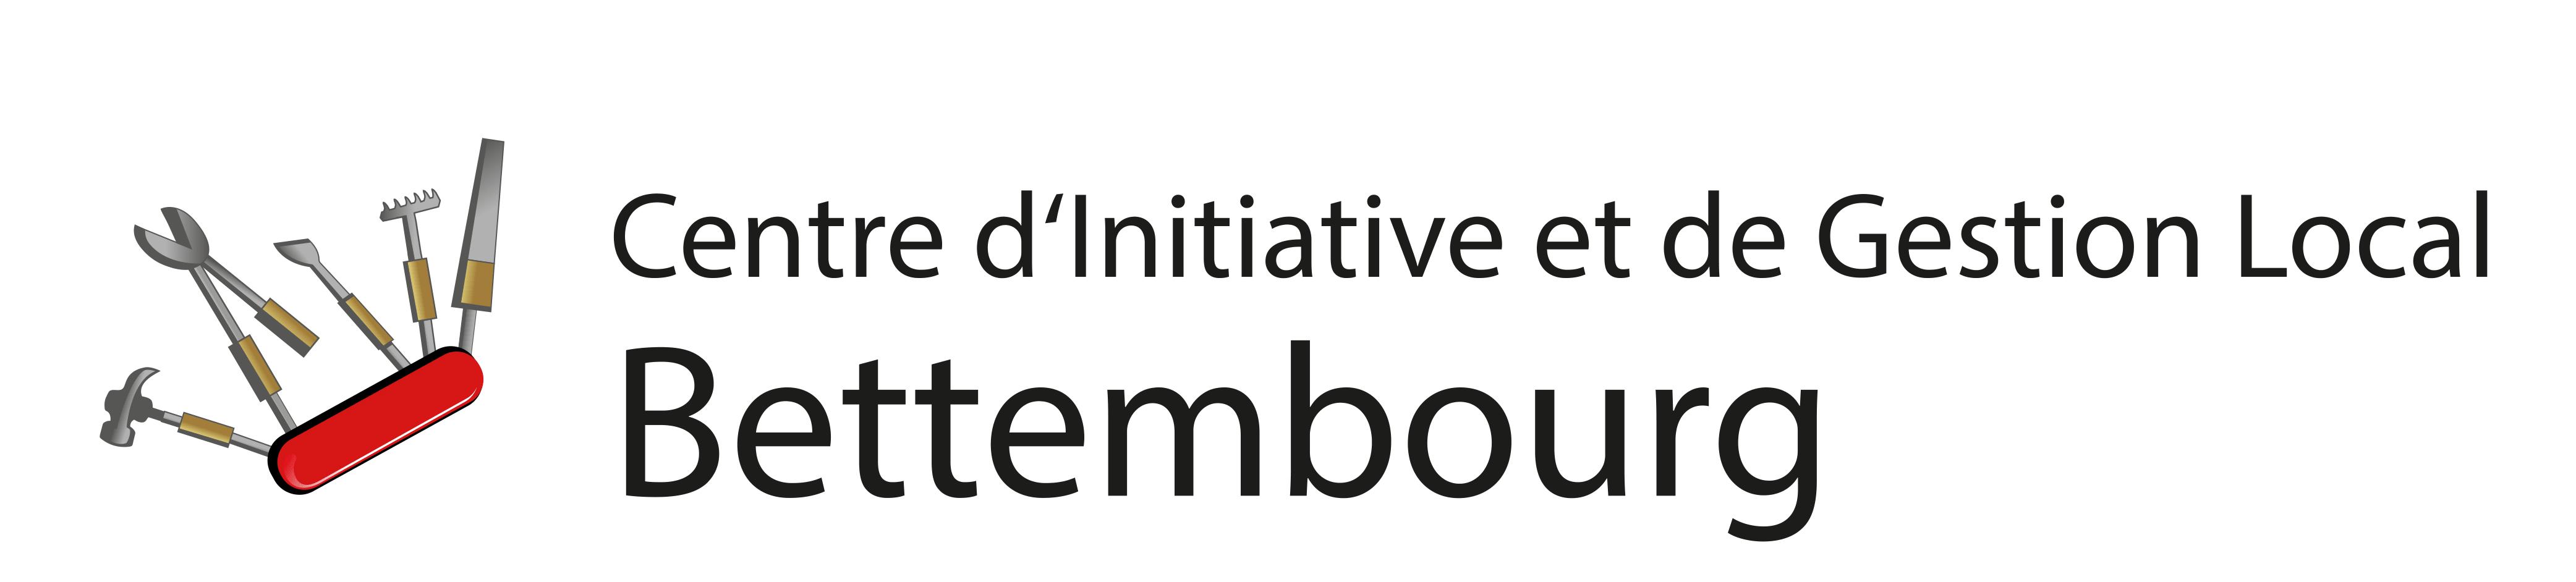 CIGL Bettembourg